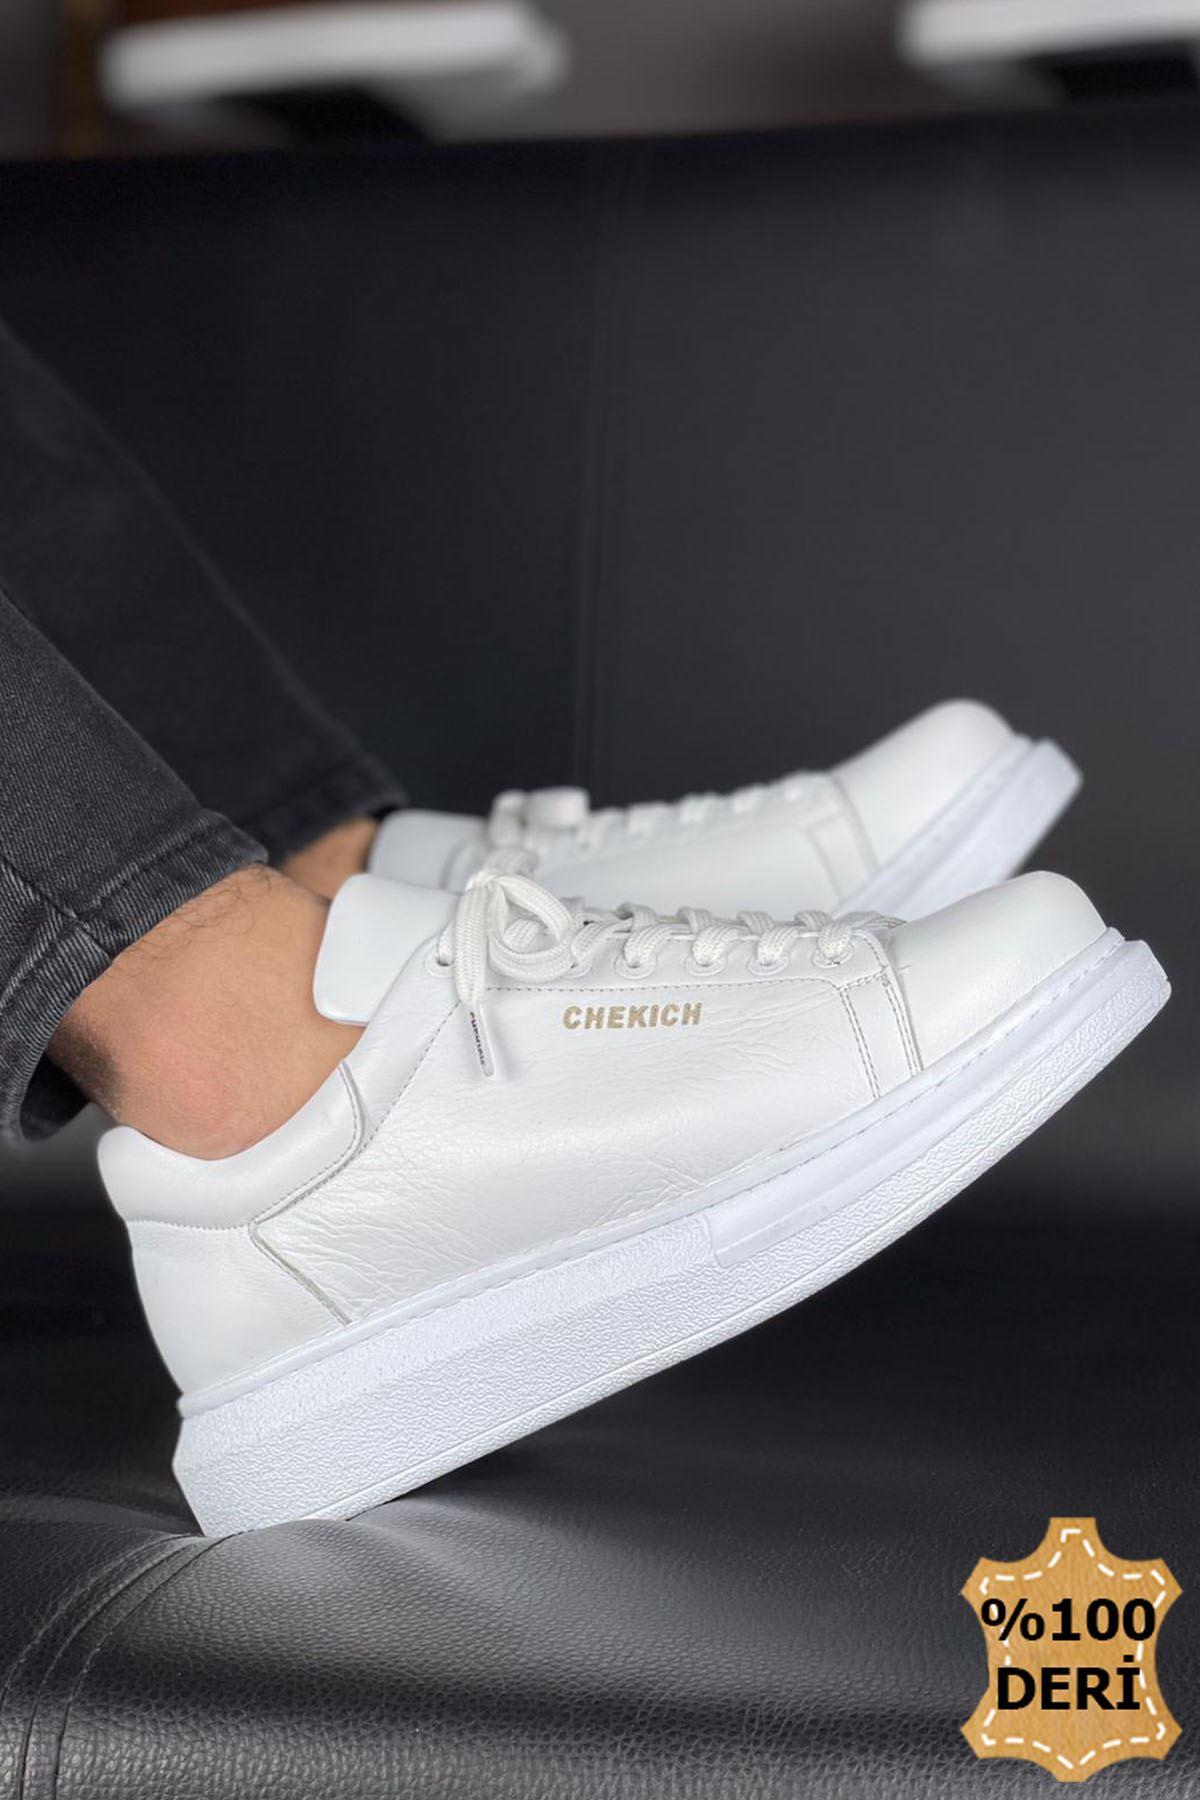 Chekich CH257 BT Hakiki Deri Erkek Ayakkabı BEYAZ